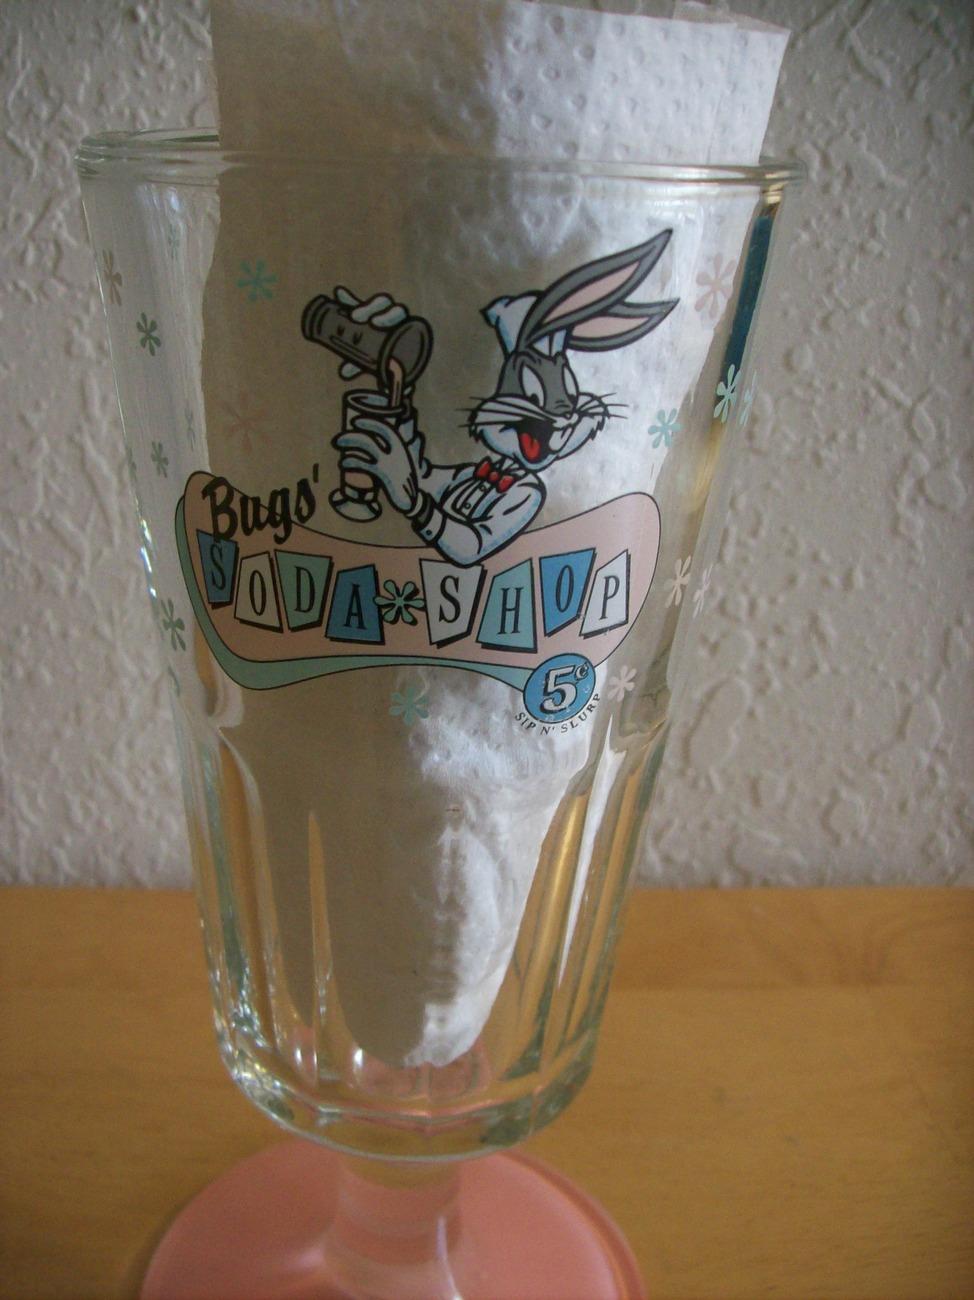 1994 Looney Tunes Bugs Bunny Soda Shop Malt Glass  image 3